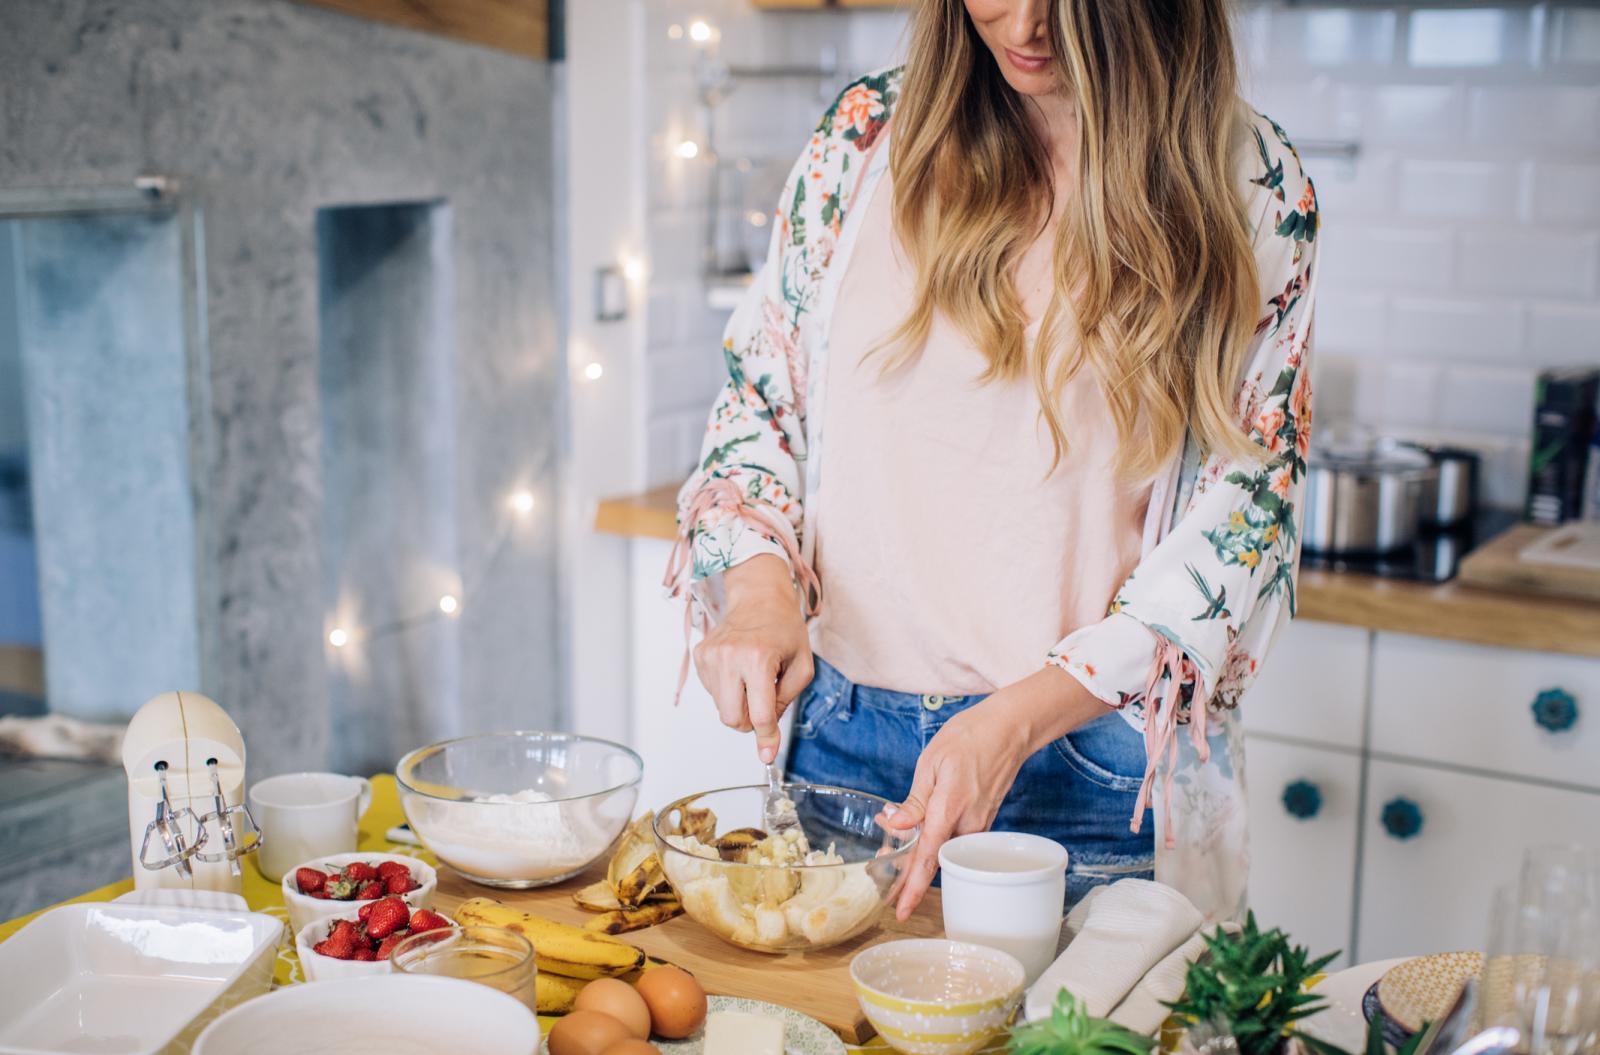 Mediteranska prehrana, koja obiluje voćem i povrćem, pravi je put da svoje tijelo, uz magnezij iz prirodne mineralne vode, opskrbite magnezijem.